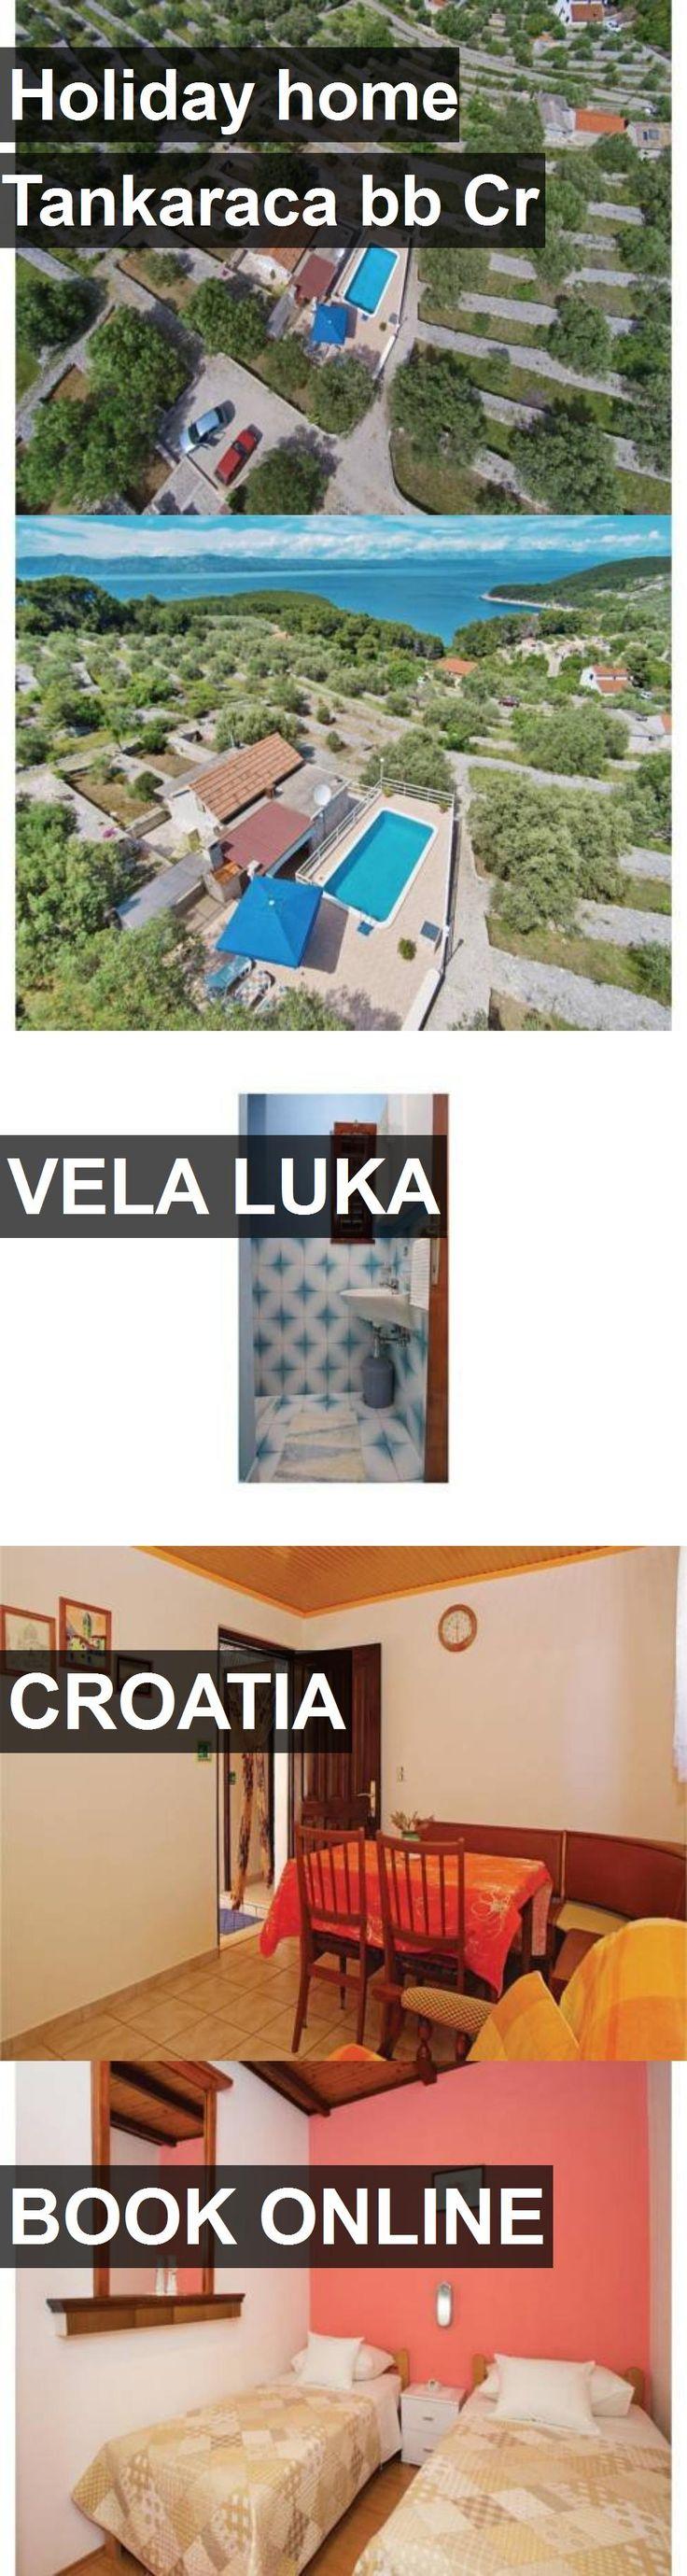 Hotel Holiday home Tankaraca bb Cr in Vela Luka, Croatia. For more information, photos, reviews and best prices please follow the link. #Croatia #VelaLuka #HolidayhomeTankaracabbCr #hotel #travel #vacation